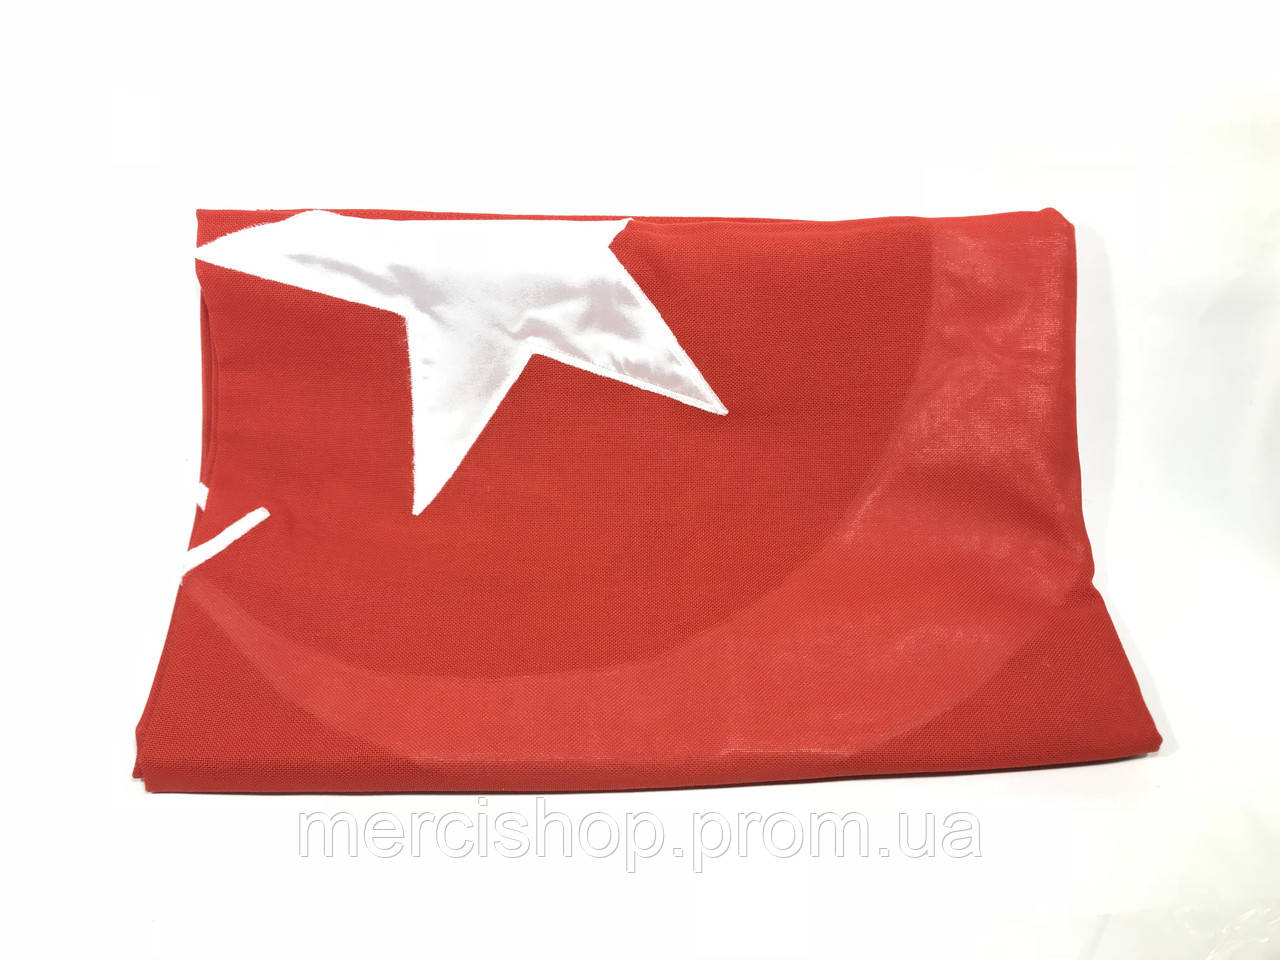 Флаг Турции (Аппликация) - (1м*1.5м)